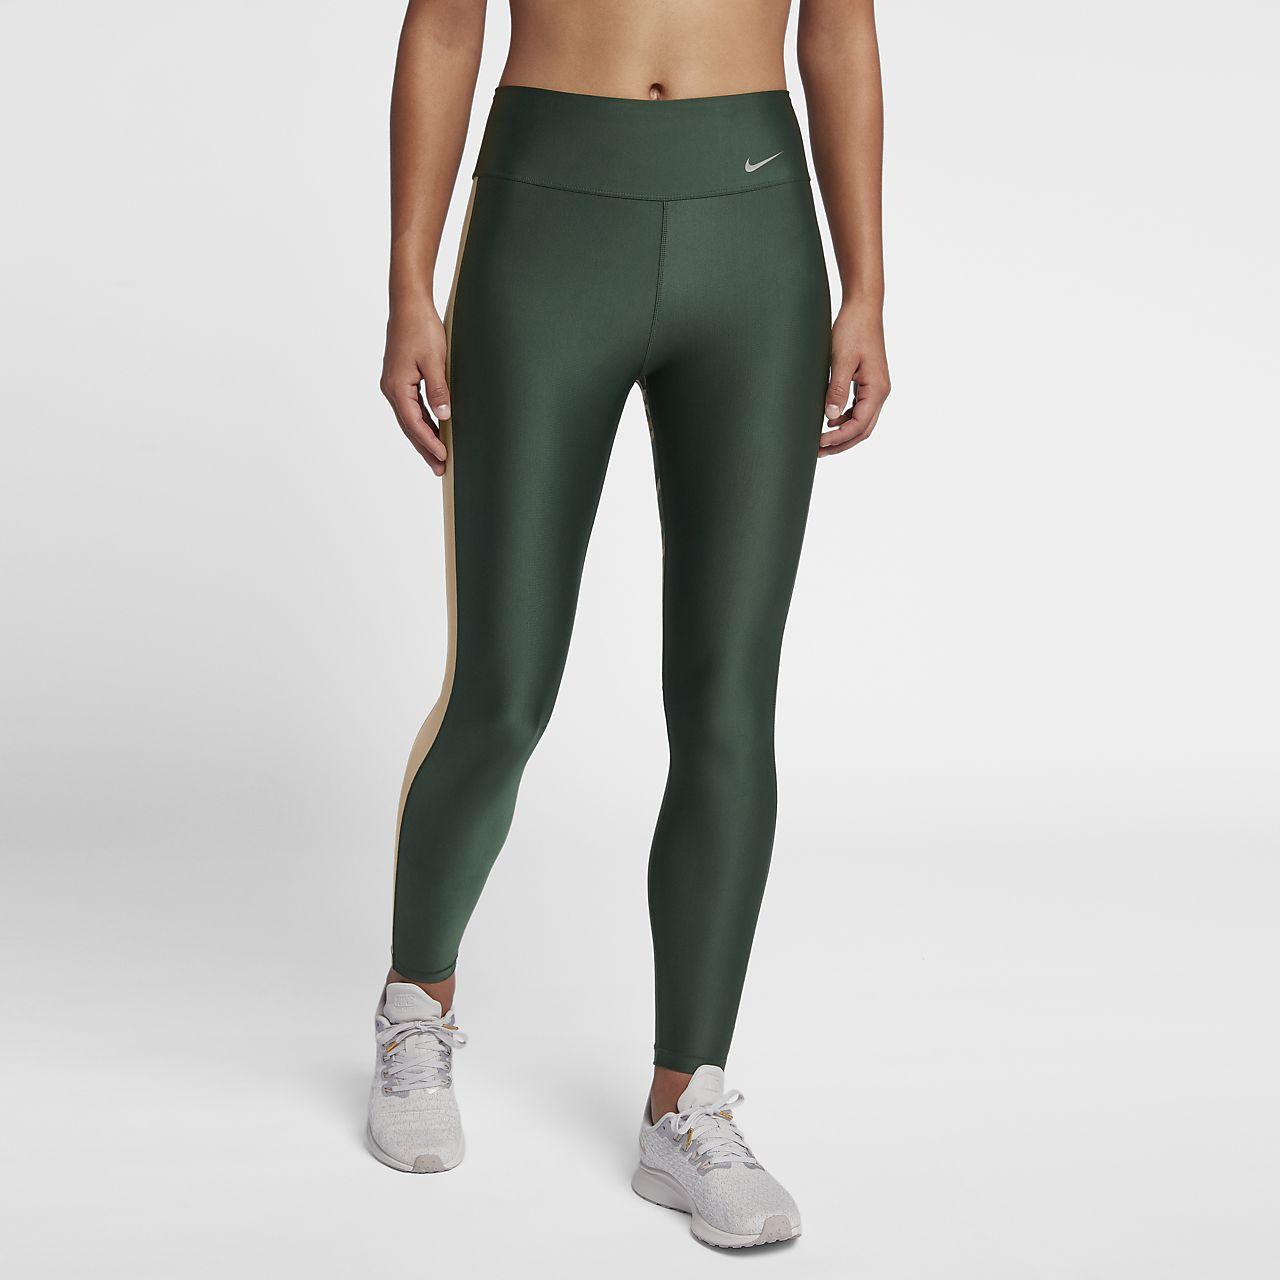 Nike Women's Training Tights